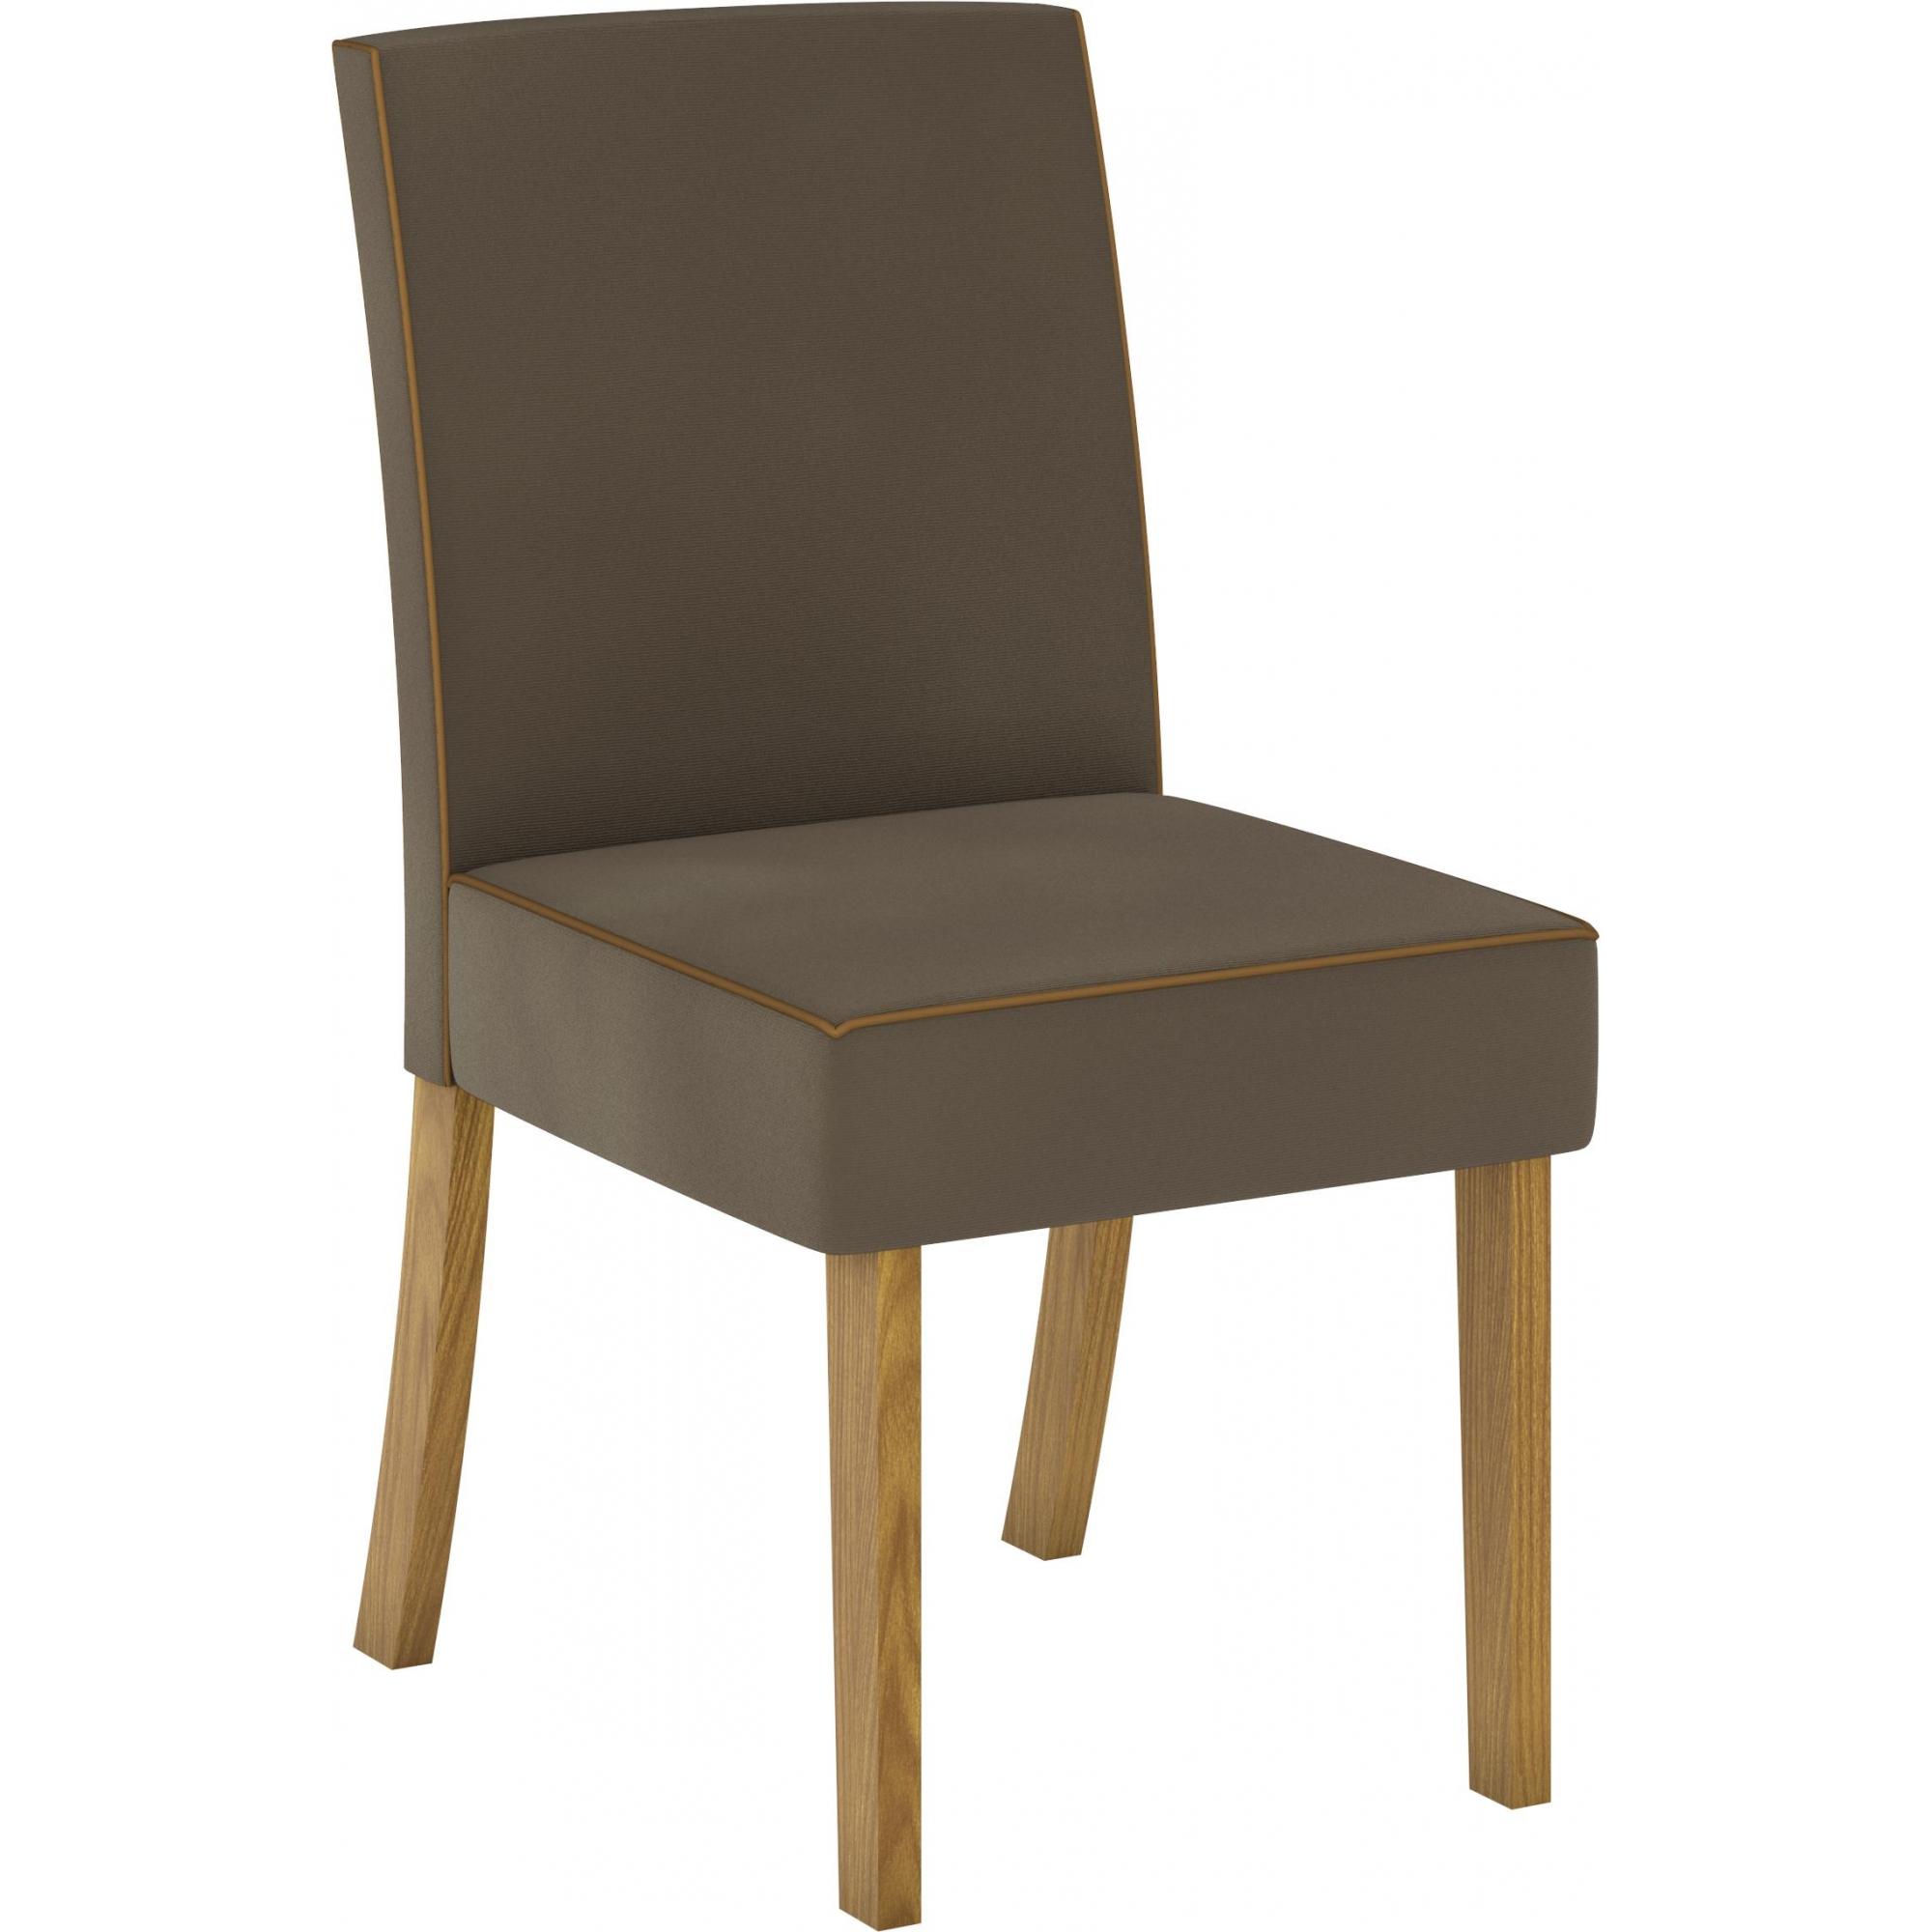 Conjunto de 02 Cadeira para Sala de Jantar Maris Nature/Bege - Henn